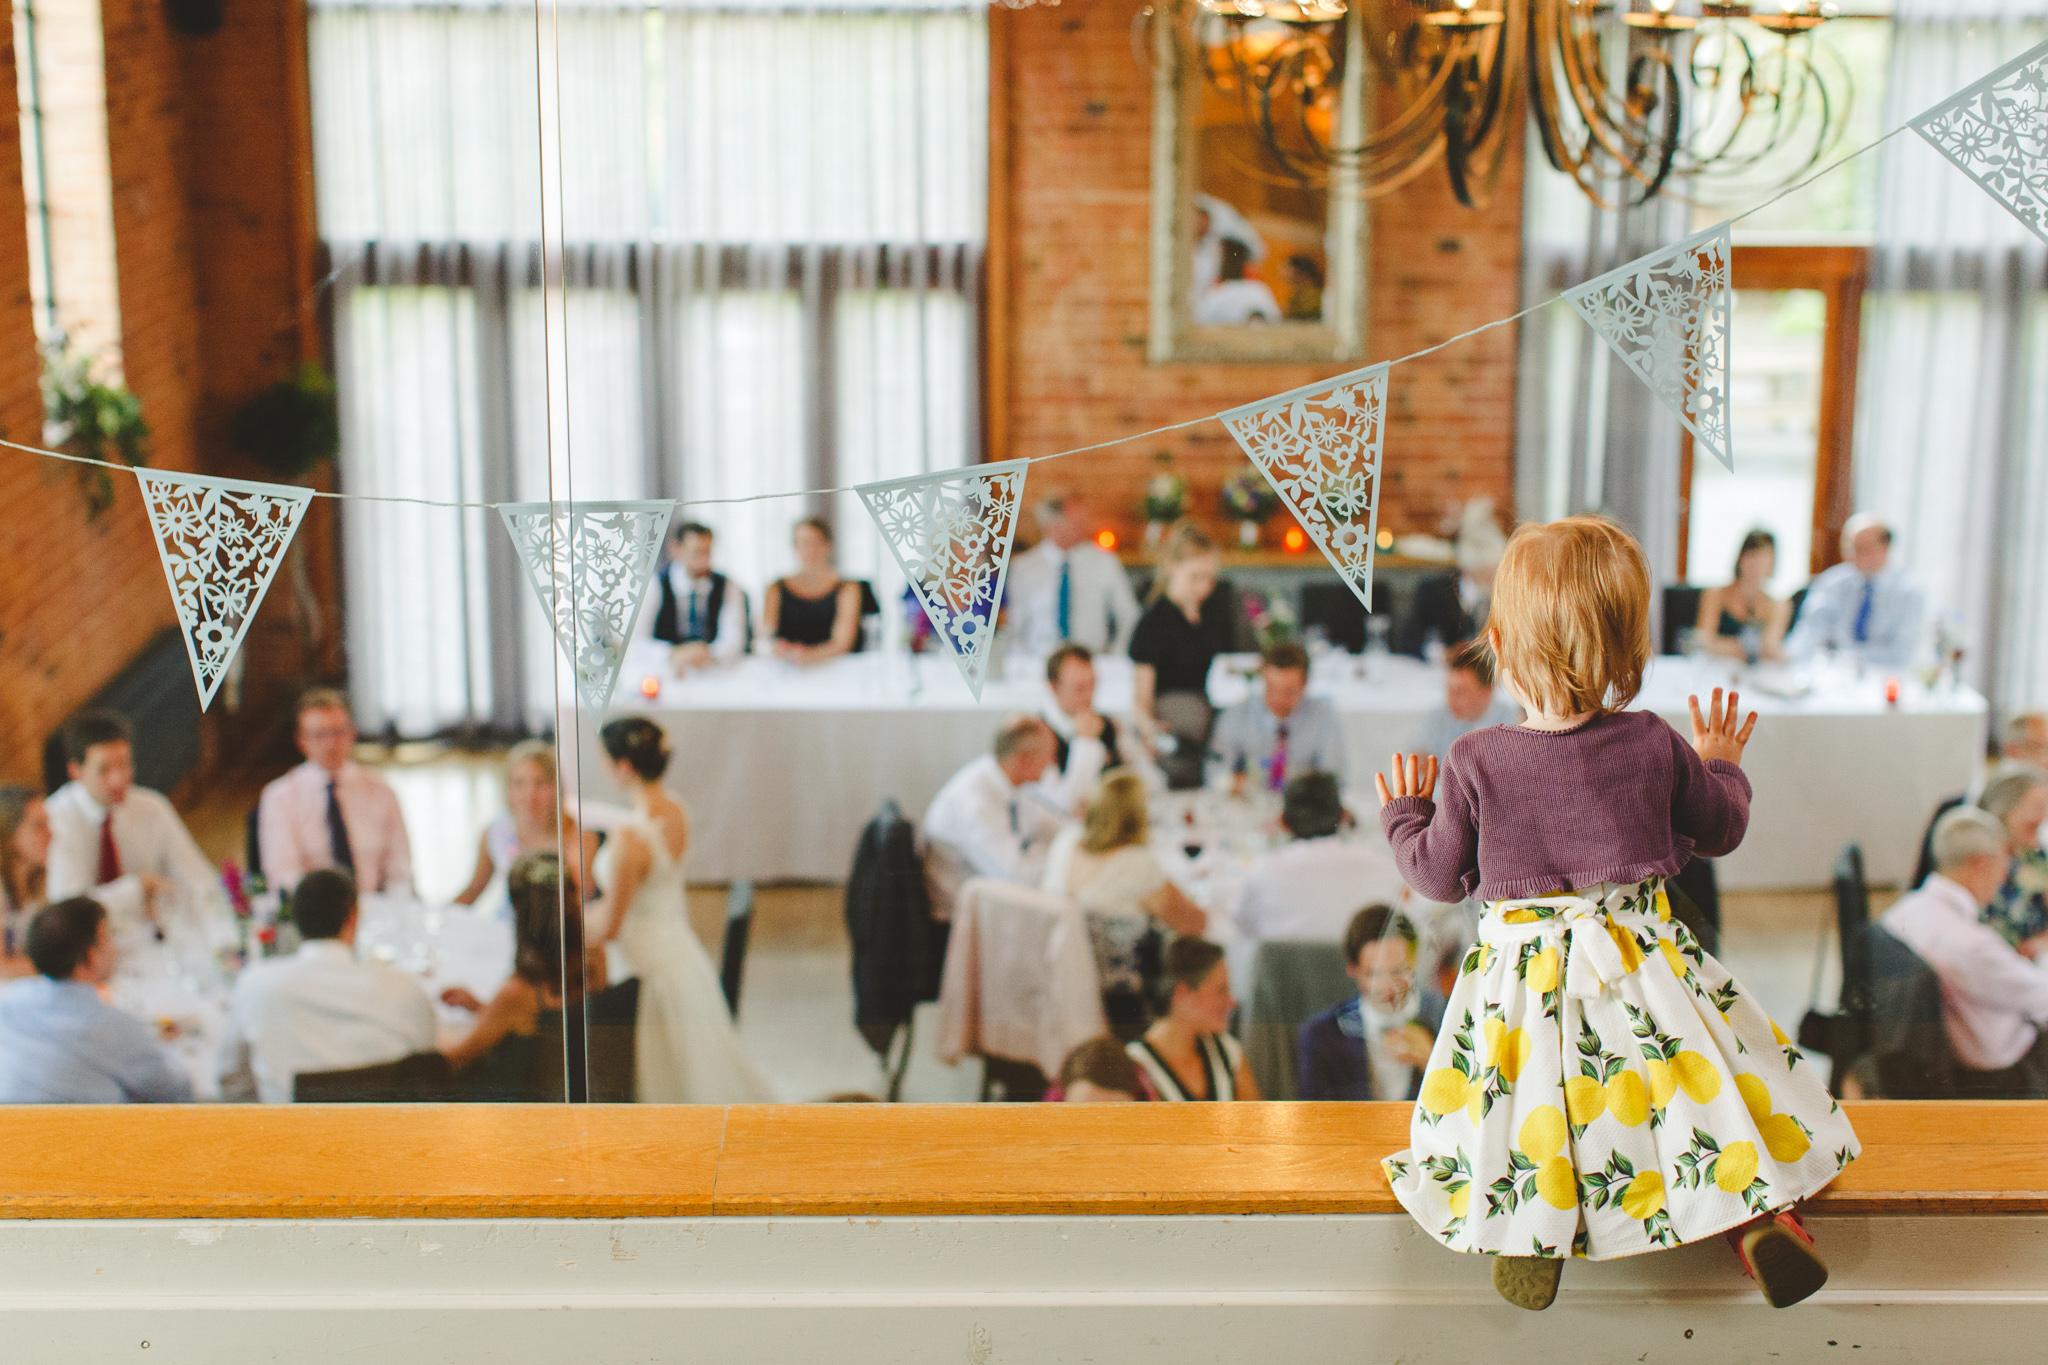 derbyshire-wedding-photographer-videographer-camera-hannah-78.jpg